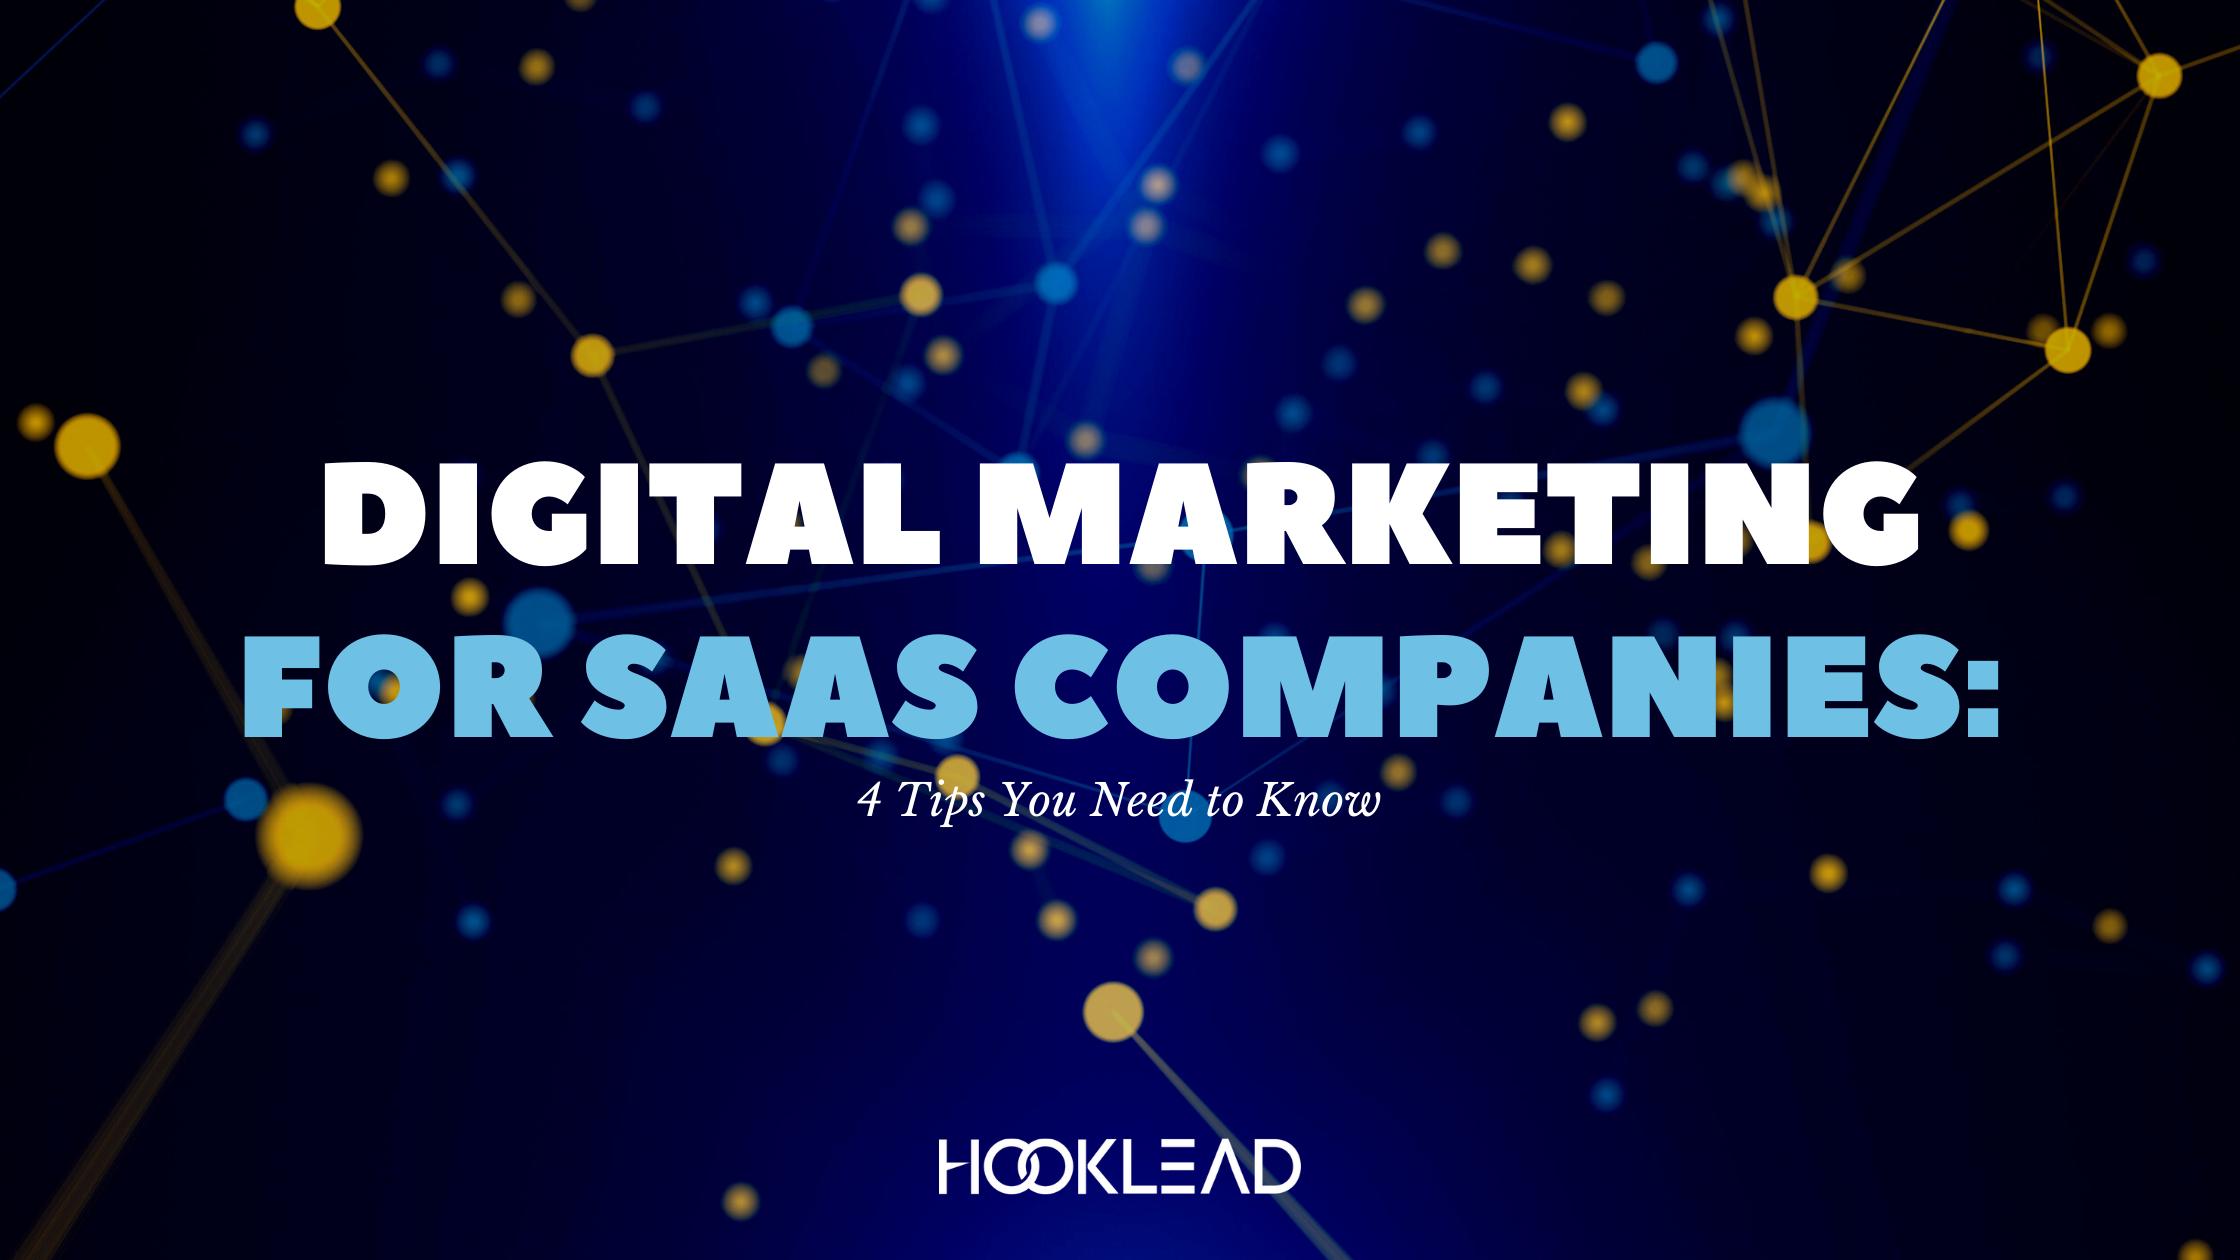 digital marketing for saas companies